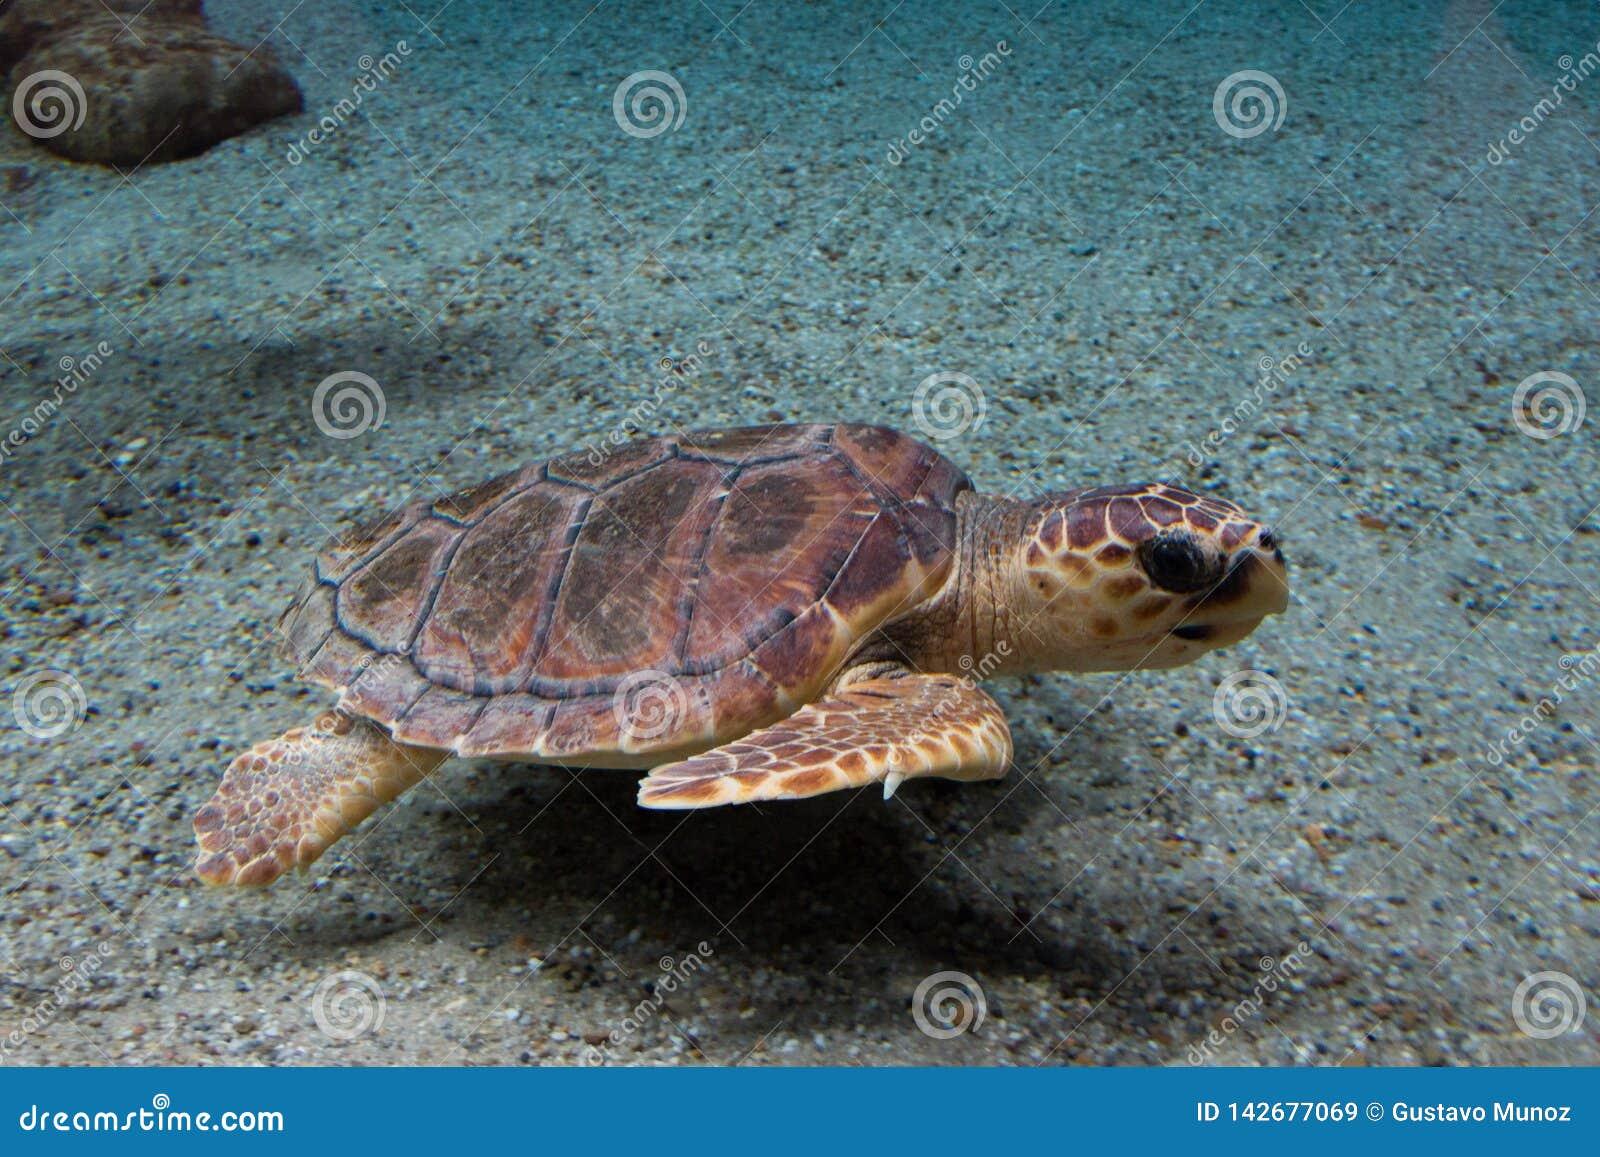 Loggerhead sea turtle Caretta caretta, also known as the loggerhead. Wild life animal